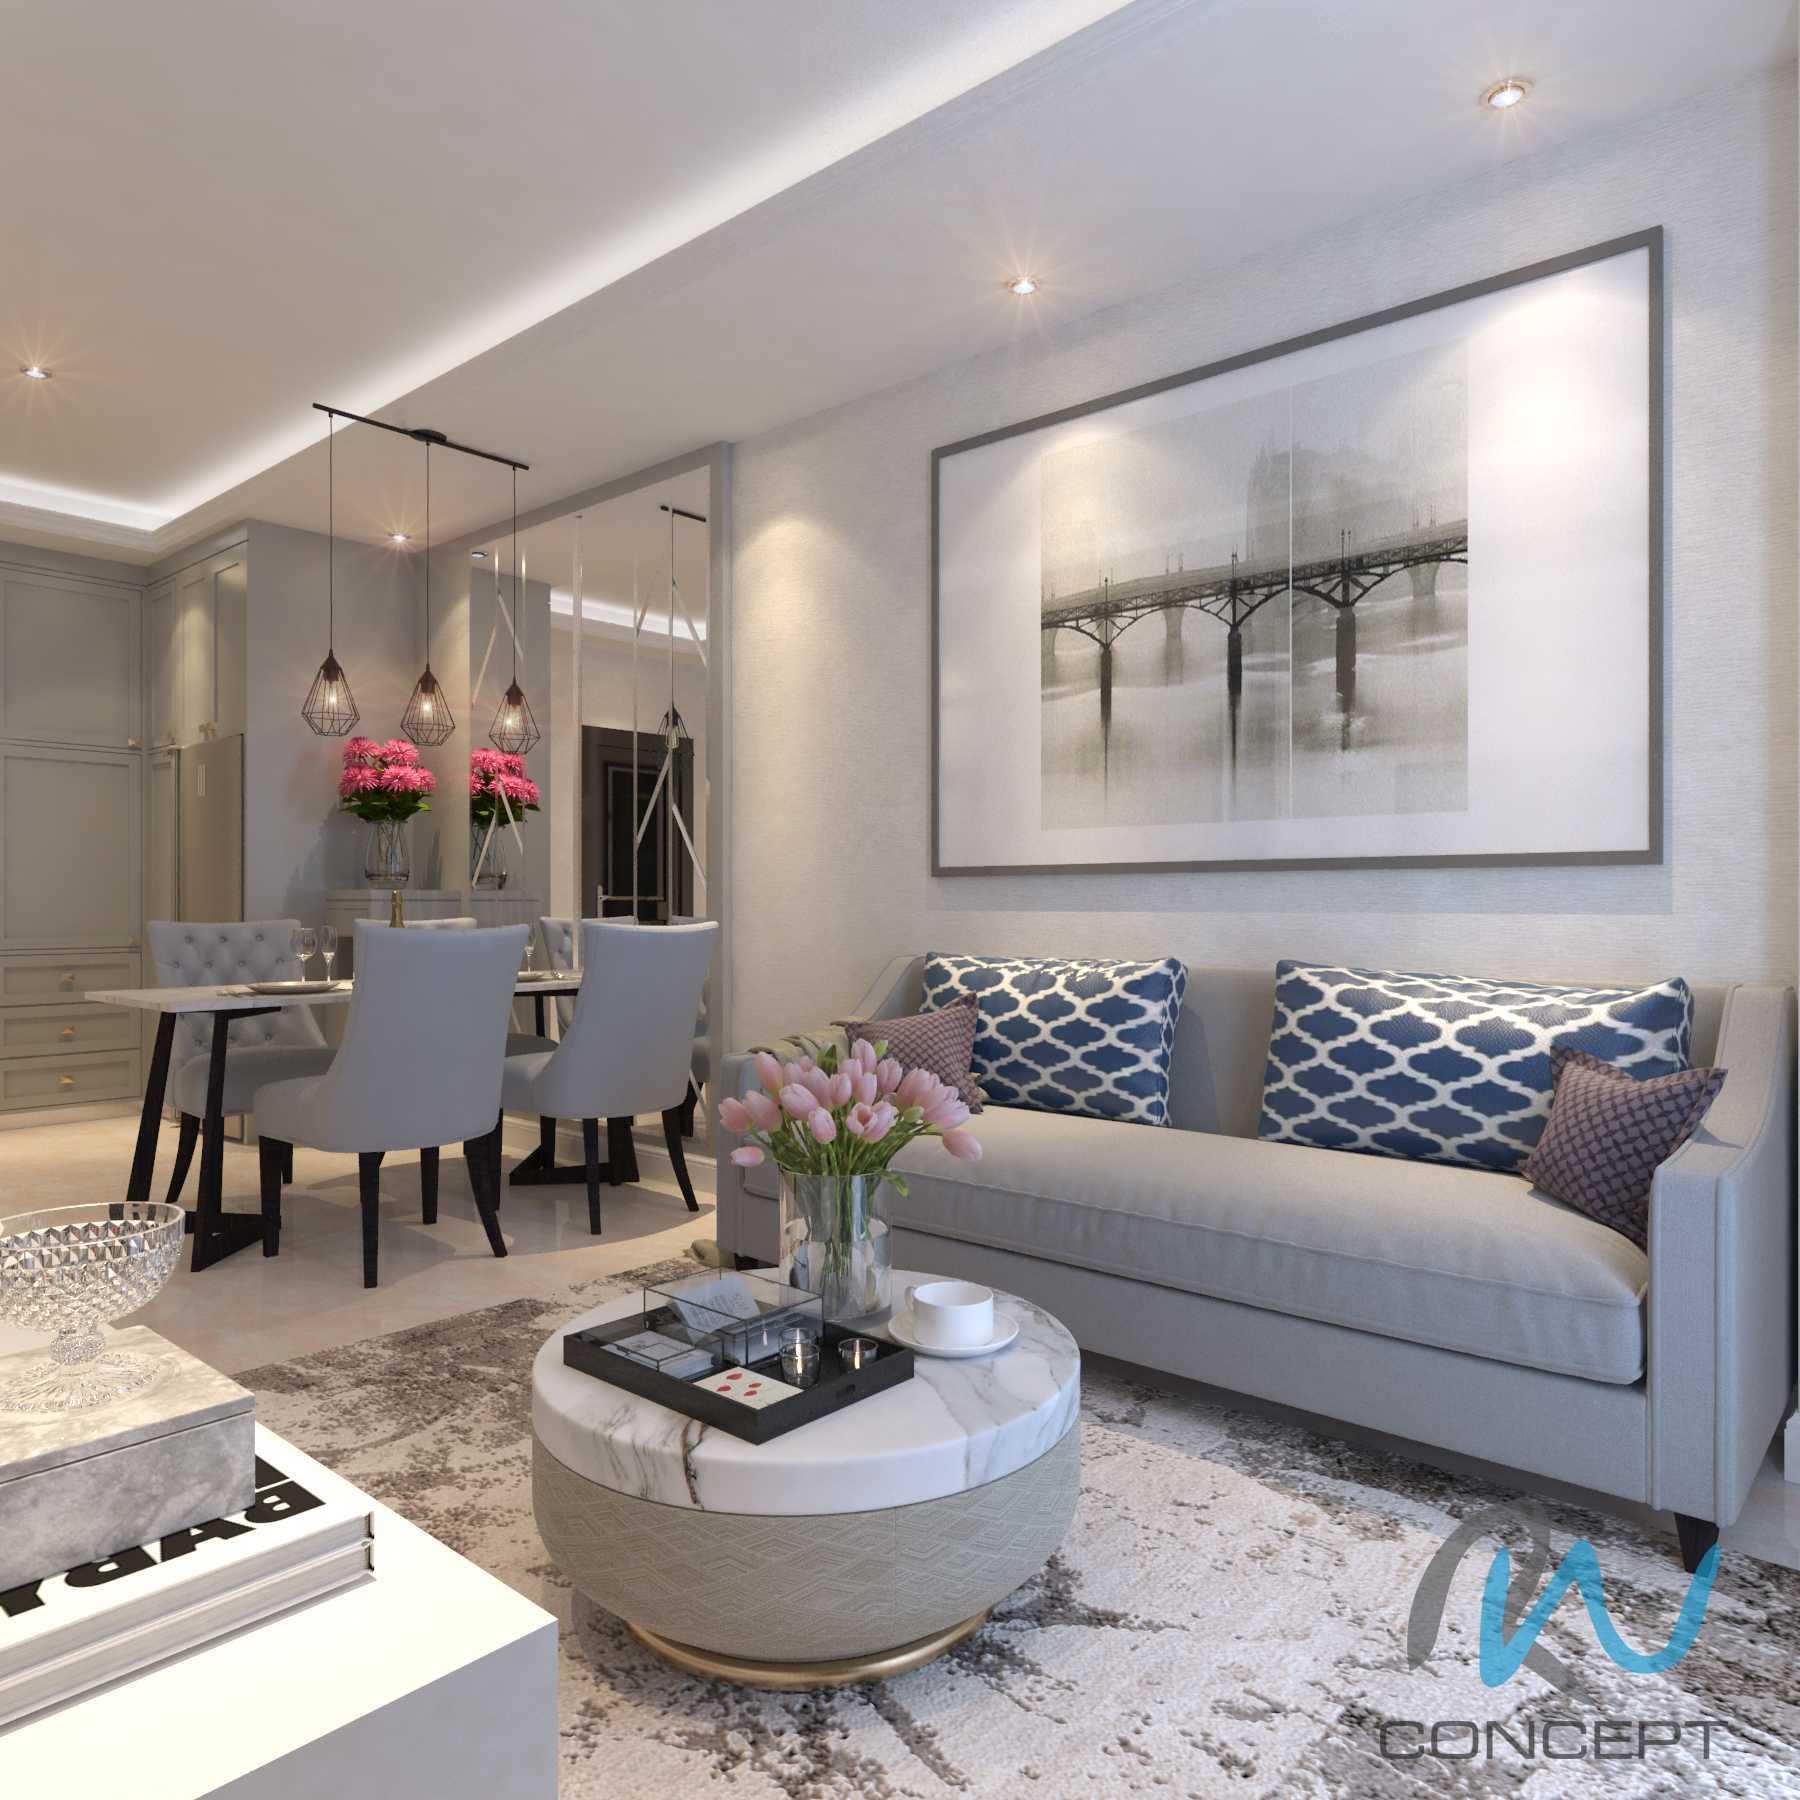 Interiaku Casa Grande Residence - Living Room Jakarta, Daerah Khusus Ibukota Jakarta, Indonesia Jakarta, Daerah Khusus Ibukota Jakarta, Indonesia Rw-Concept-Casa-Grande-Residence-Living-Room  61832